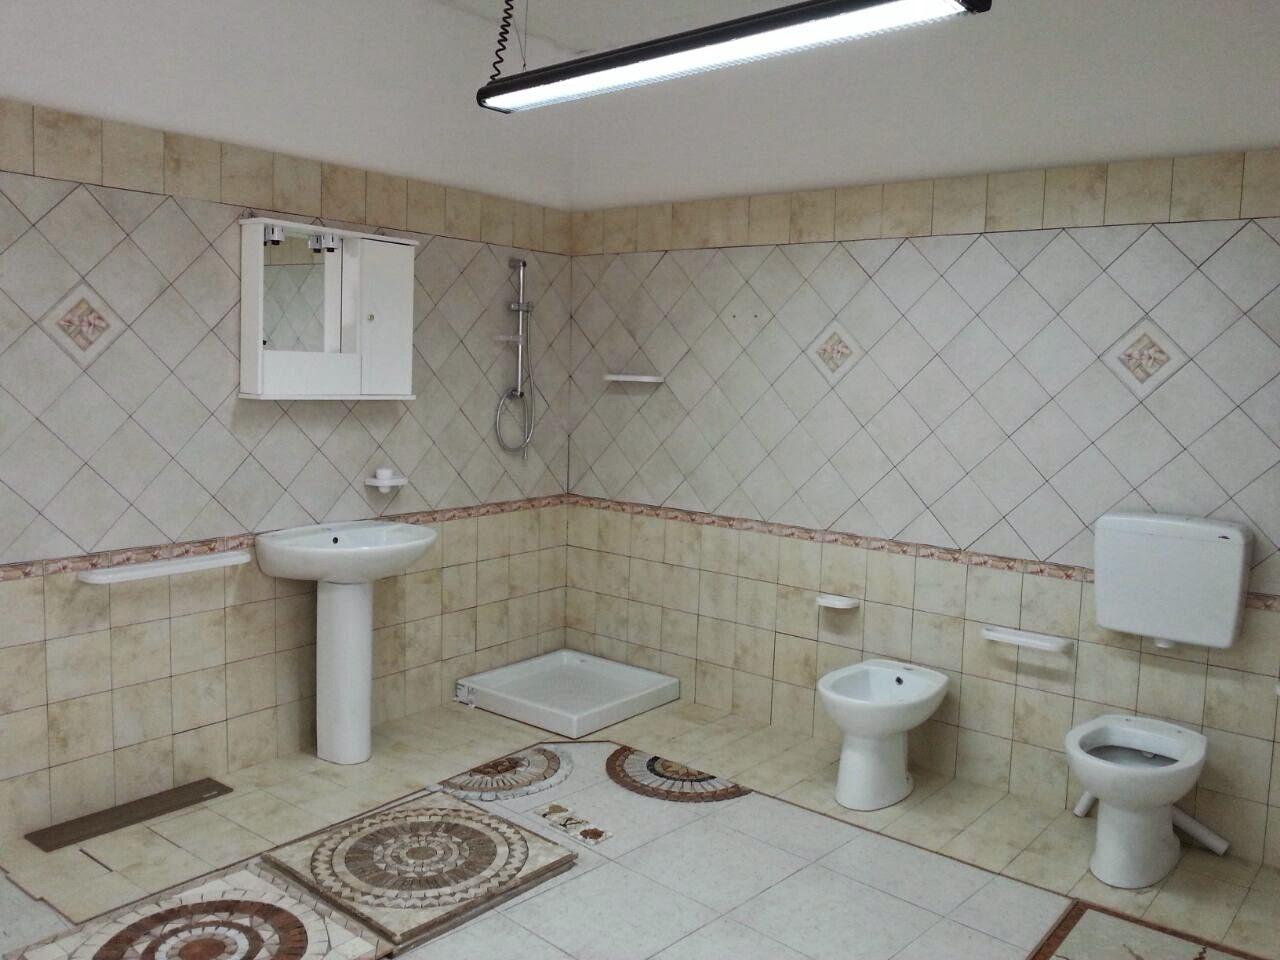 edilforniturecurreri: Offerta bagno